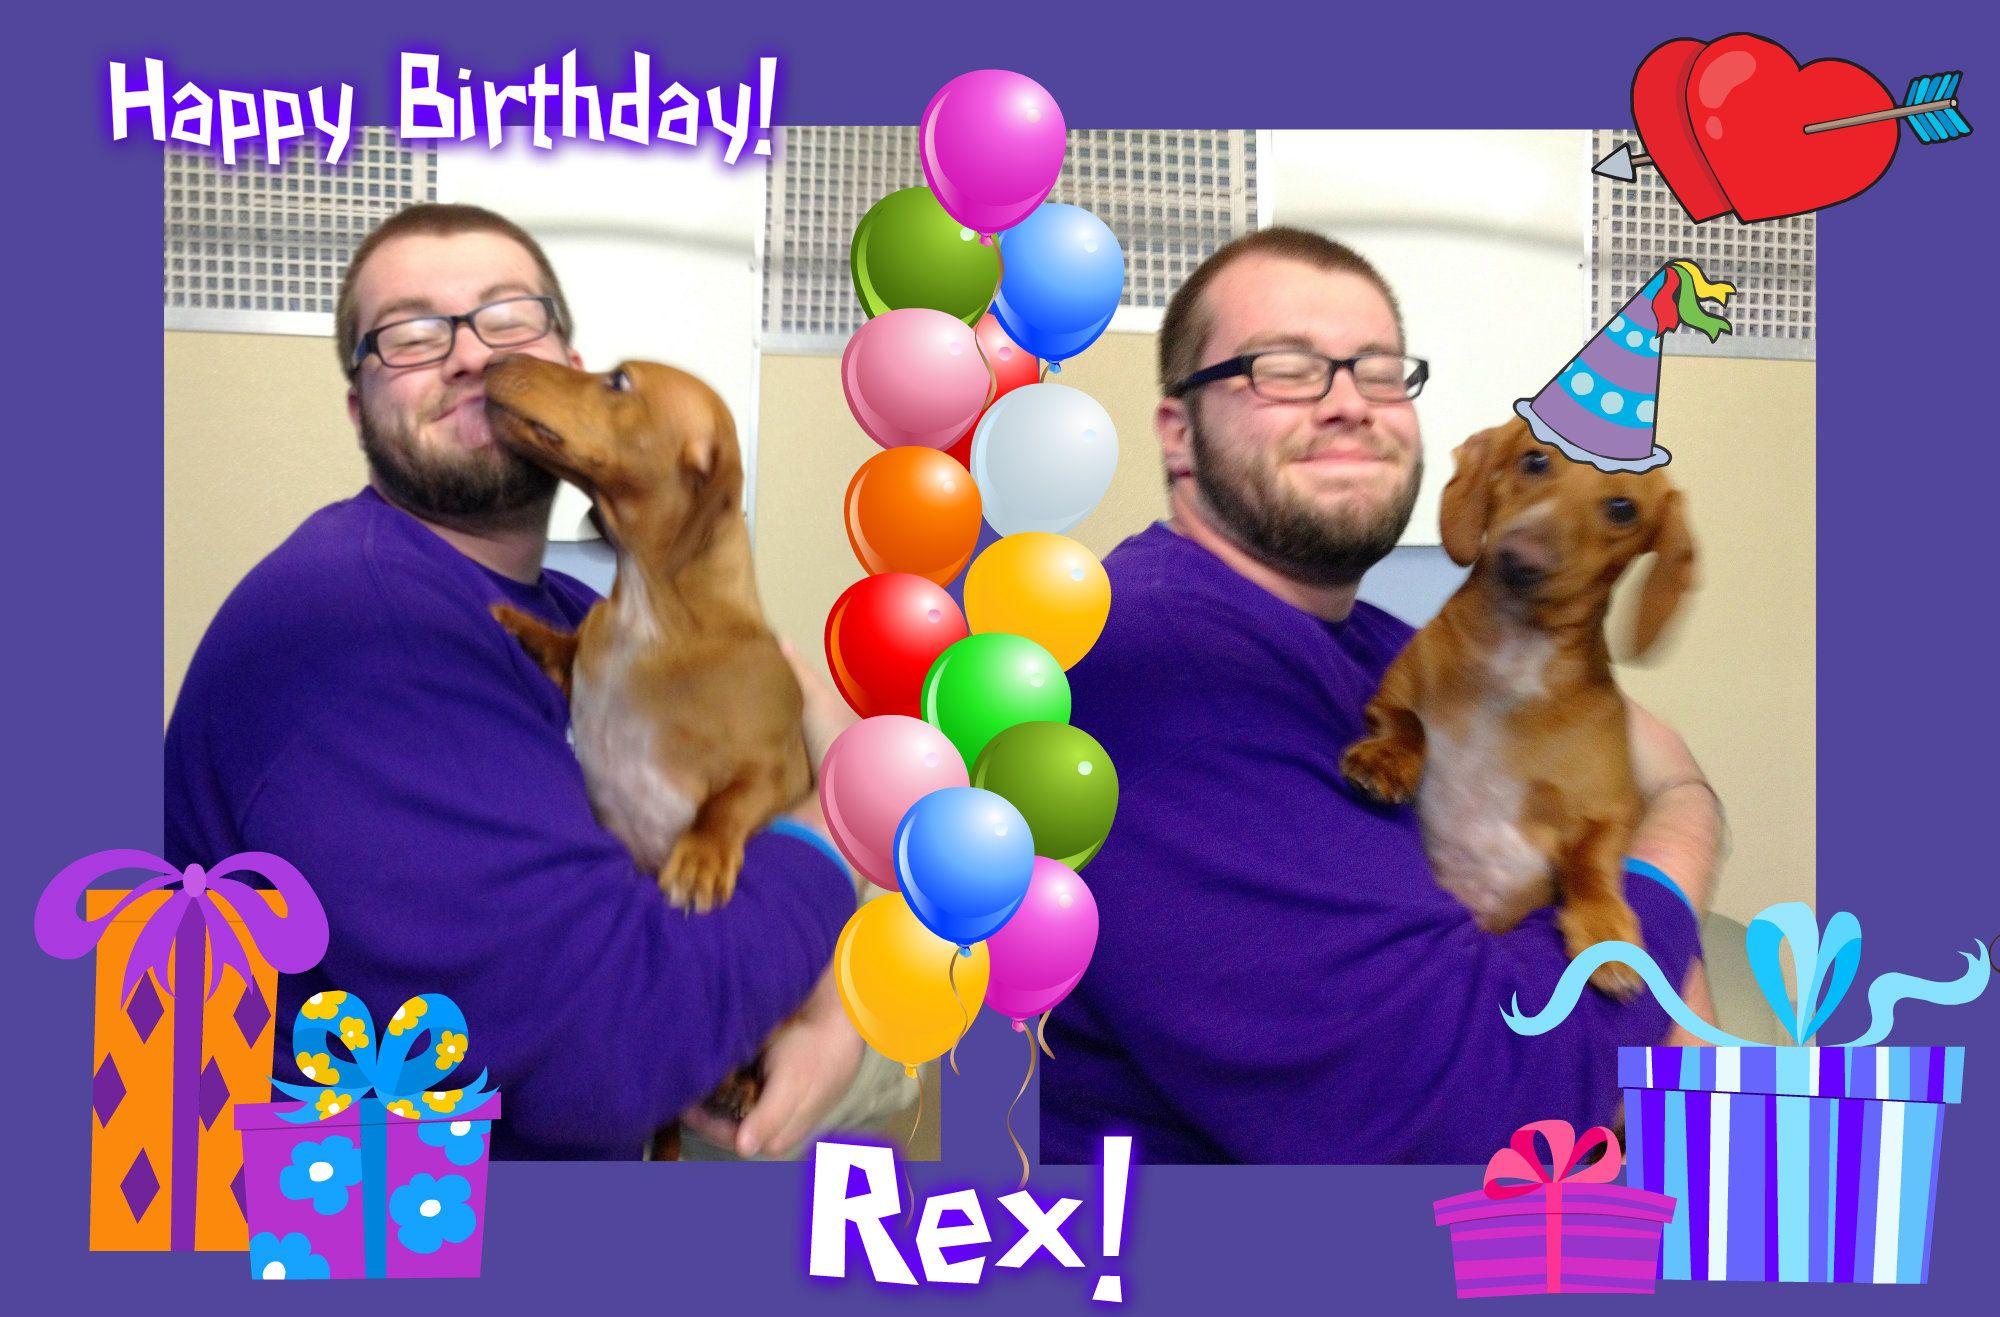 Happy Birthday, Rex!